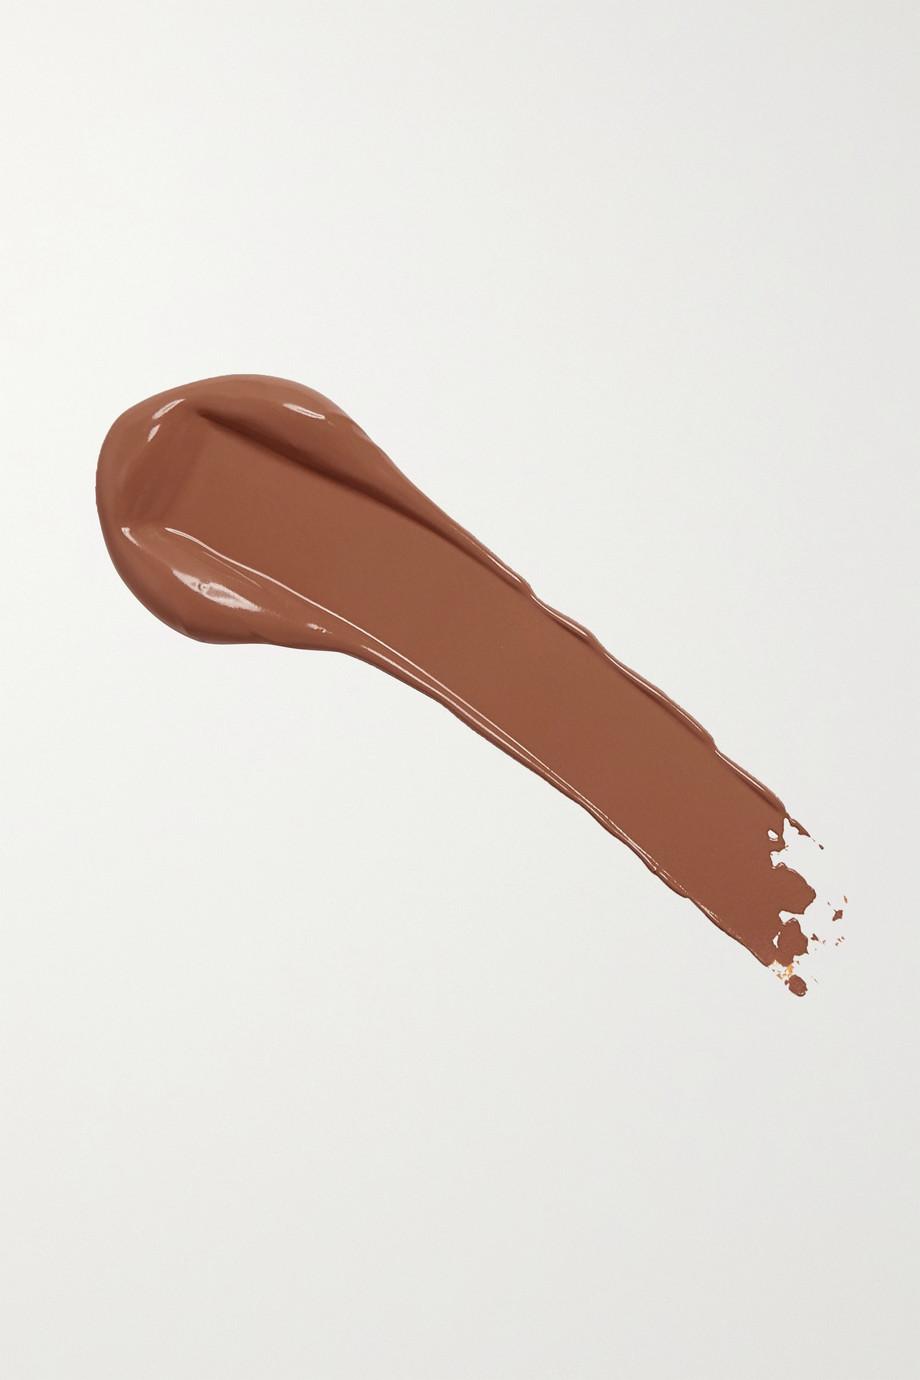 Huda Beauty FauxFilter Luminous Matte Liquid Foundation - Cocoa 510R, 35ml